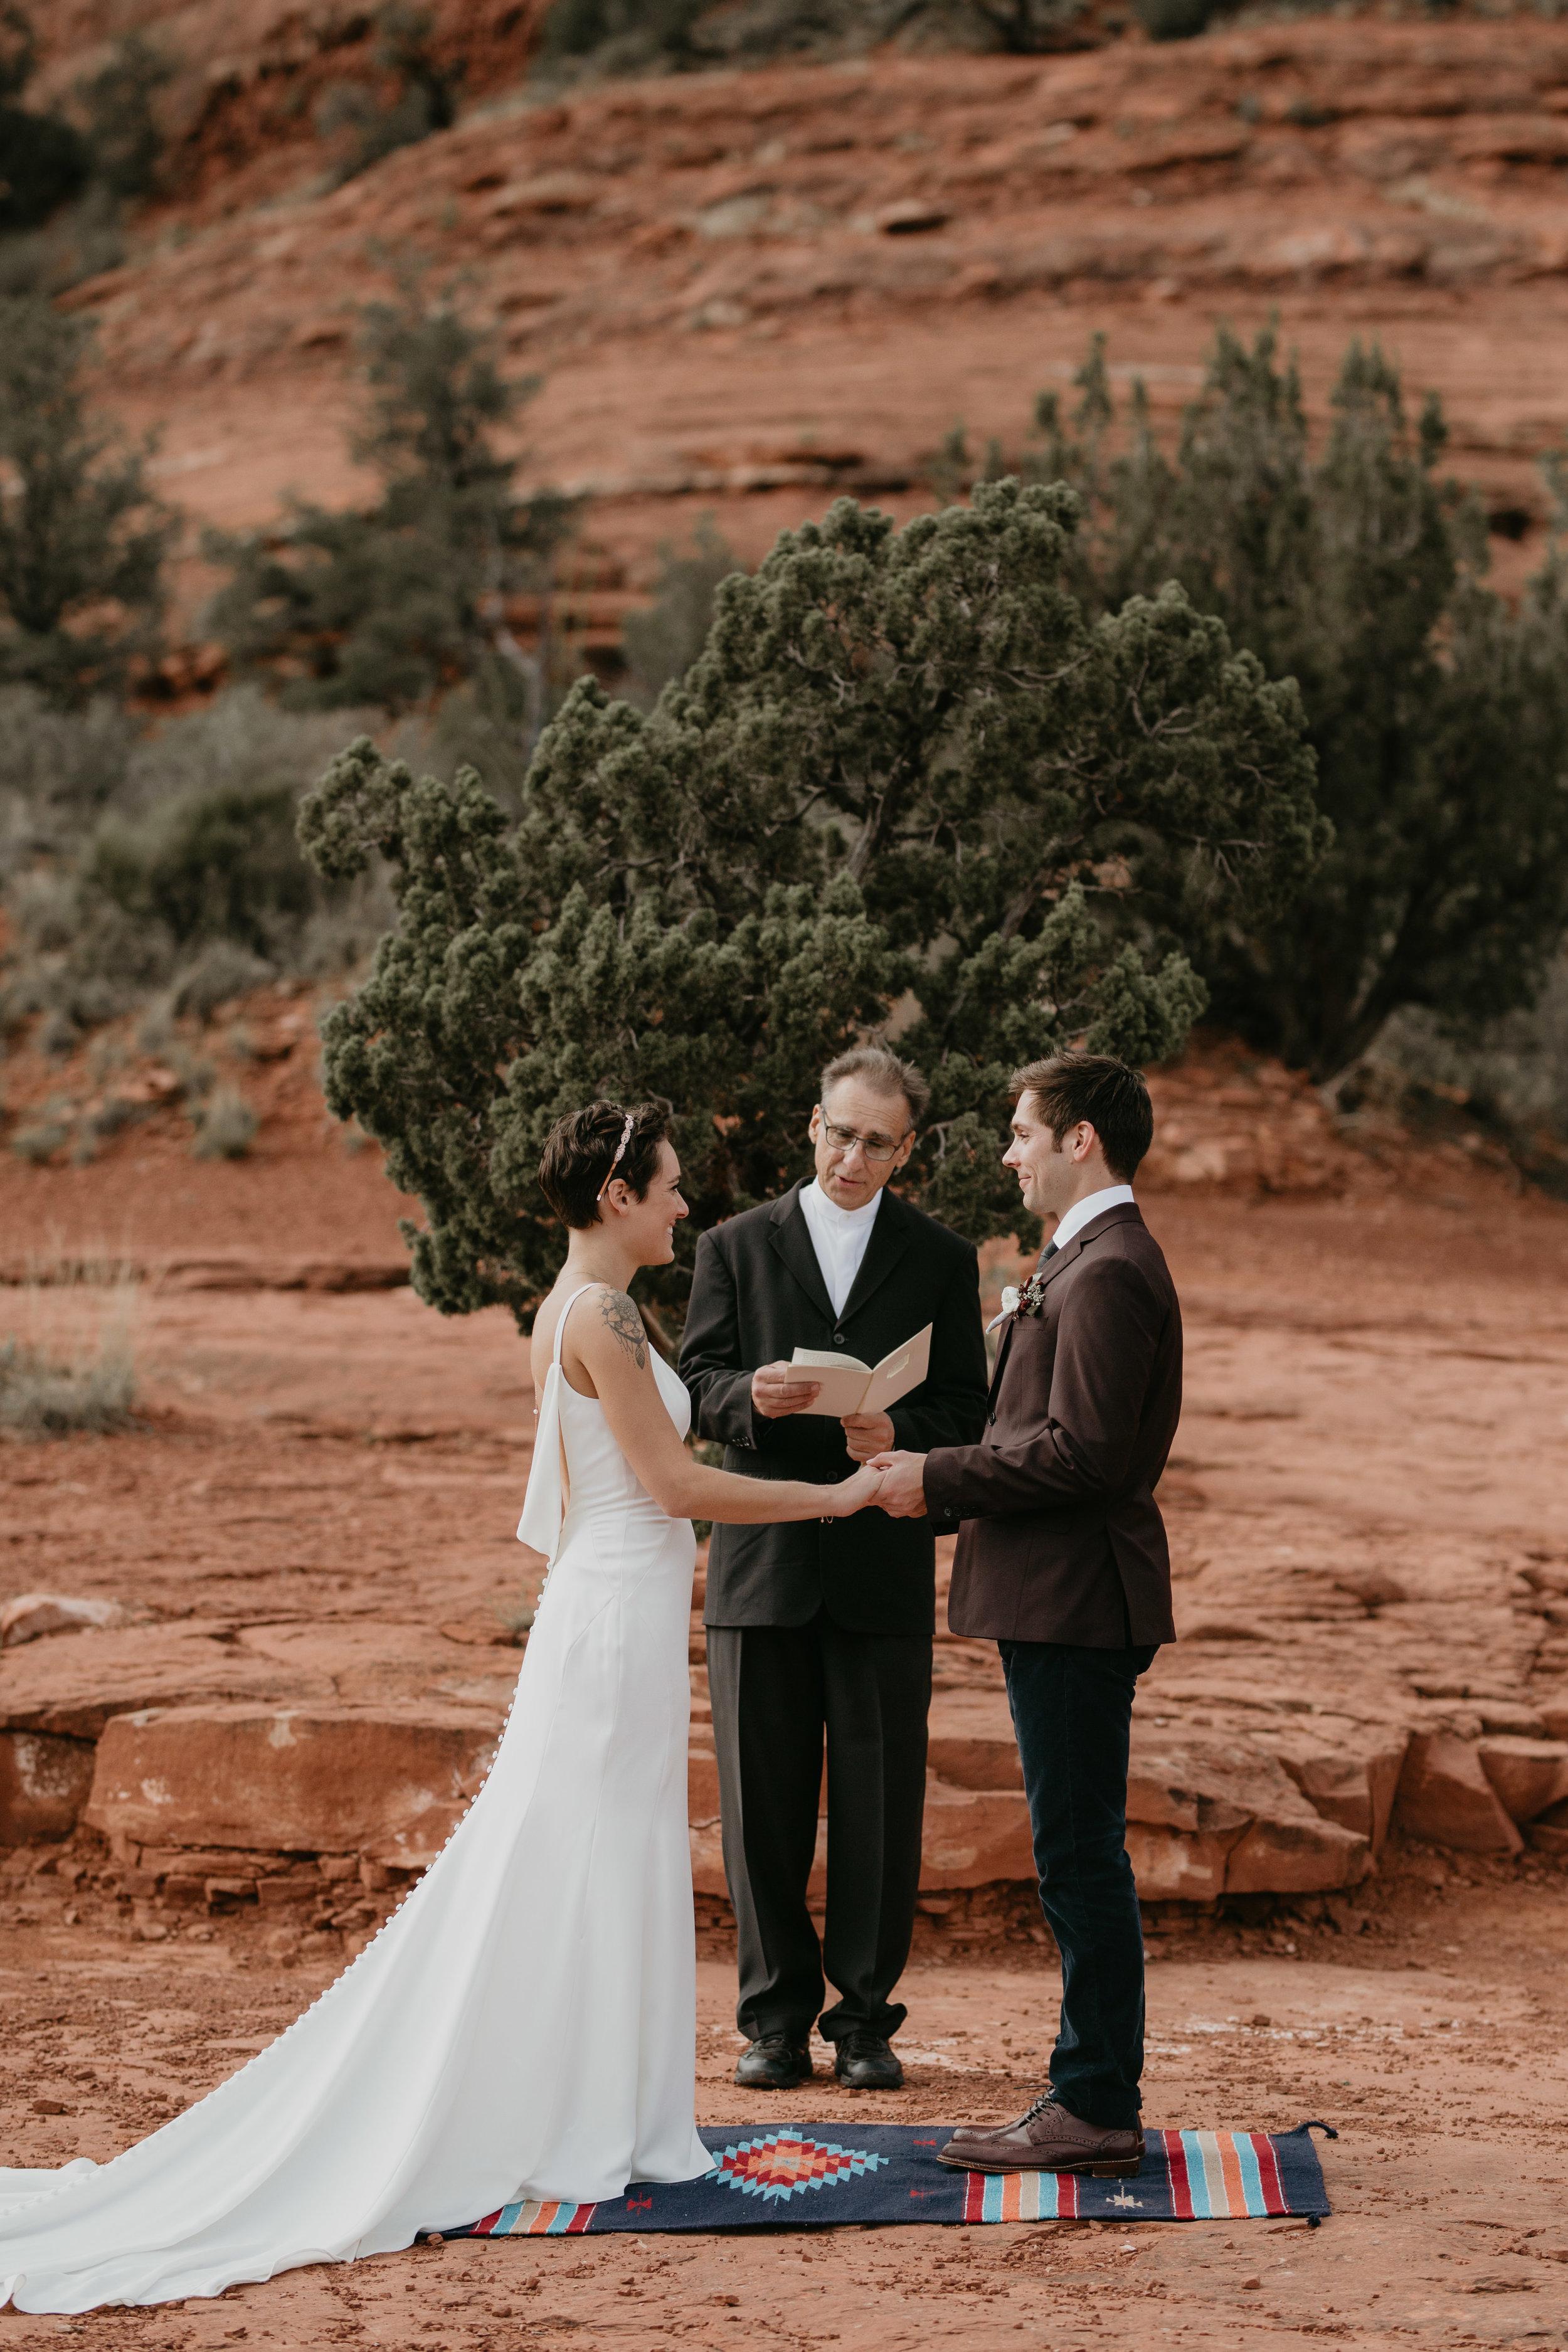 nicole-daacke-photography-sedona-arizona-destination-elopement-wedding-photographer-catherdral-rock-hiking-elopement-sedona-river-elopement-photos-desert-rock-wedding-photographer-laid-back-spontaneous-elopement-77.jpg